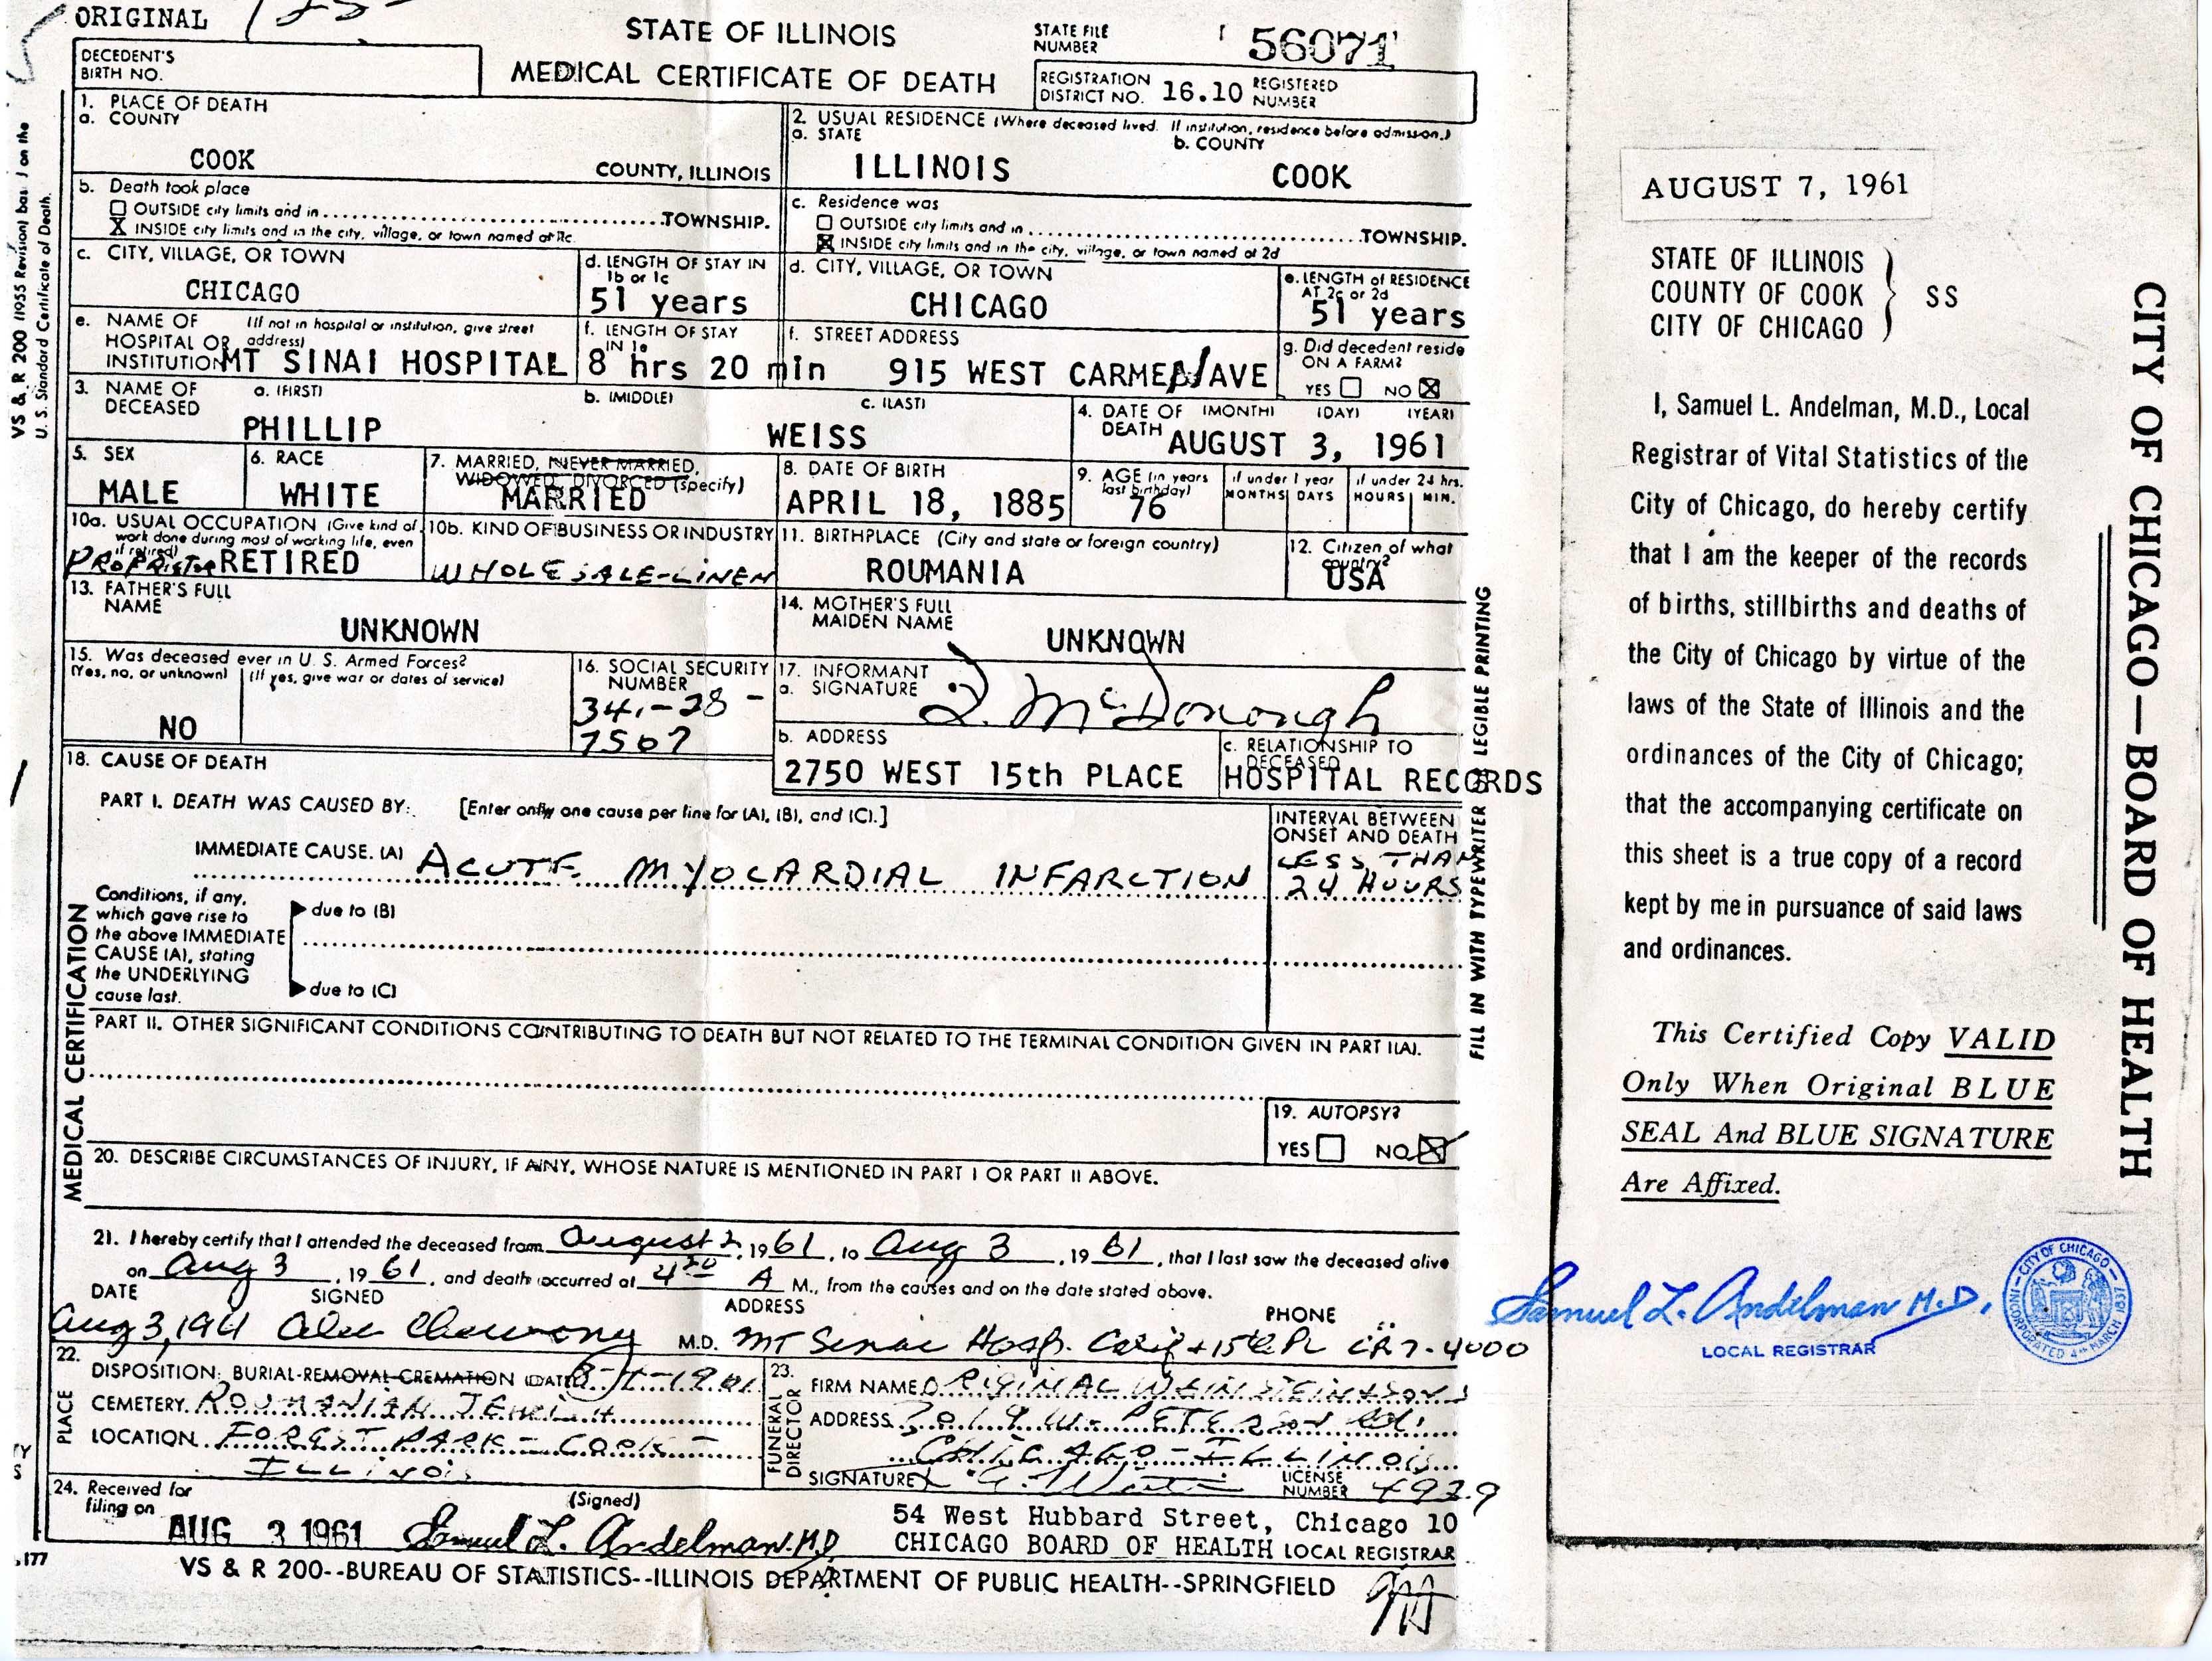 Phillip Weiss death certificate